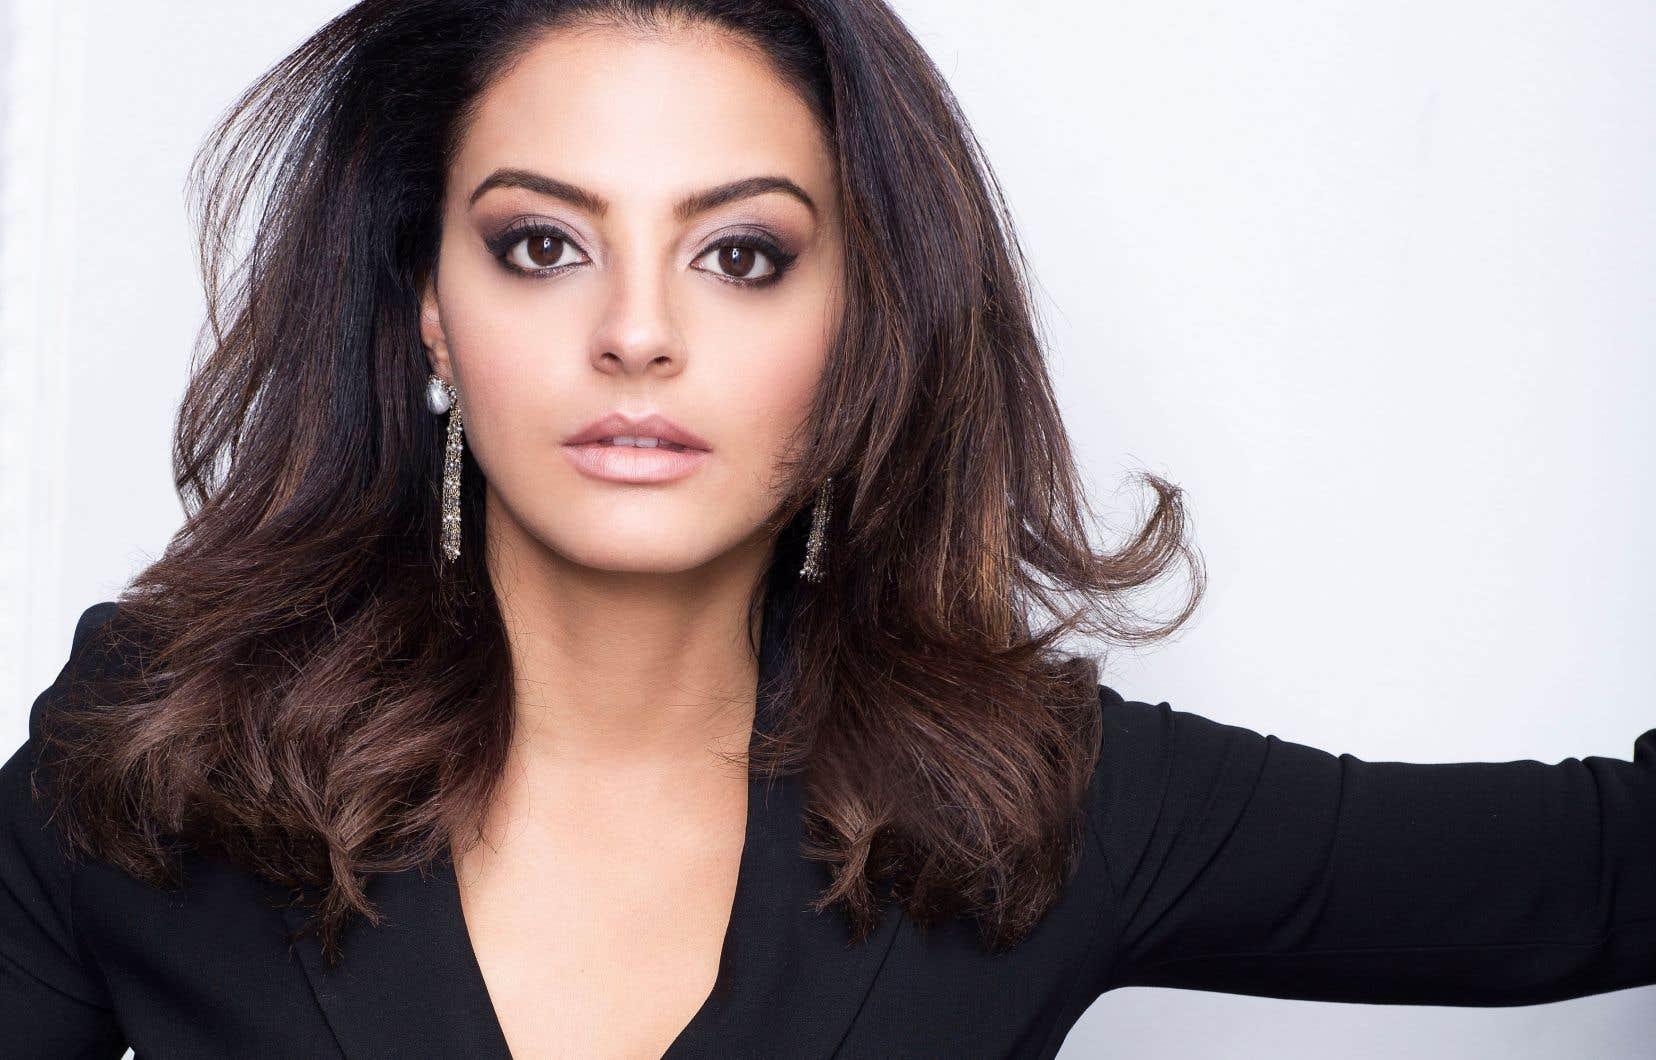 Lors du concours Operalia, Rihab Chaieb a chanté l'air de Dalila.